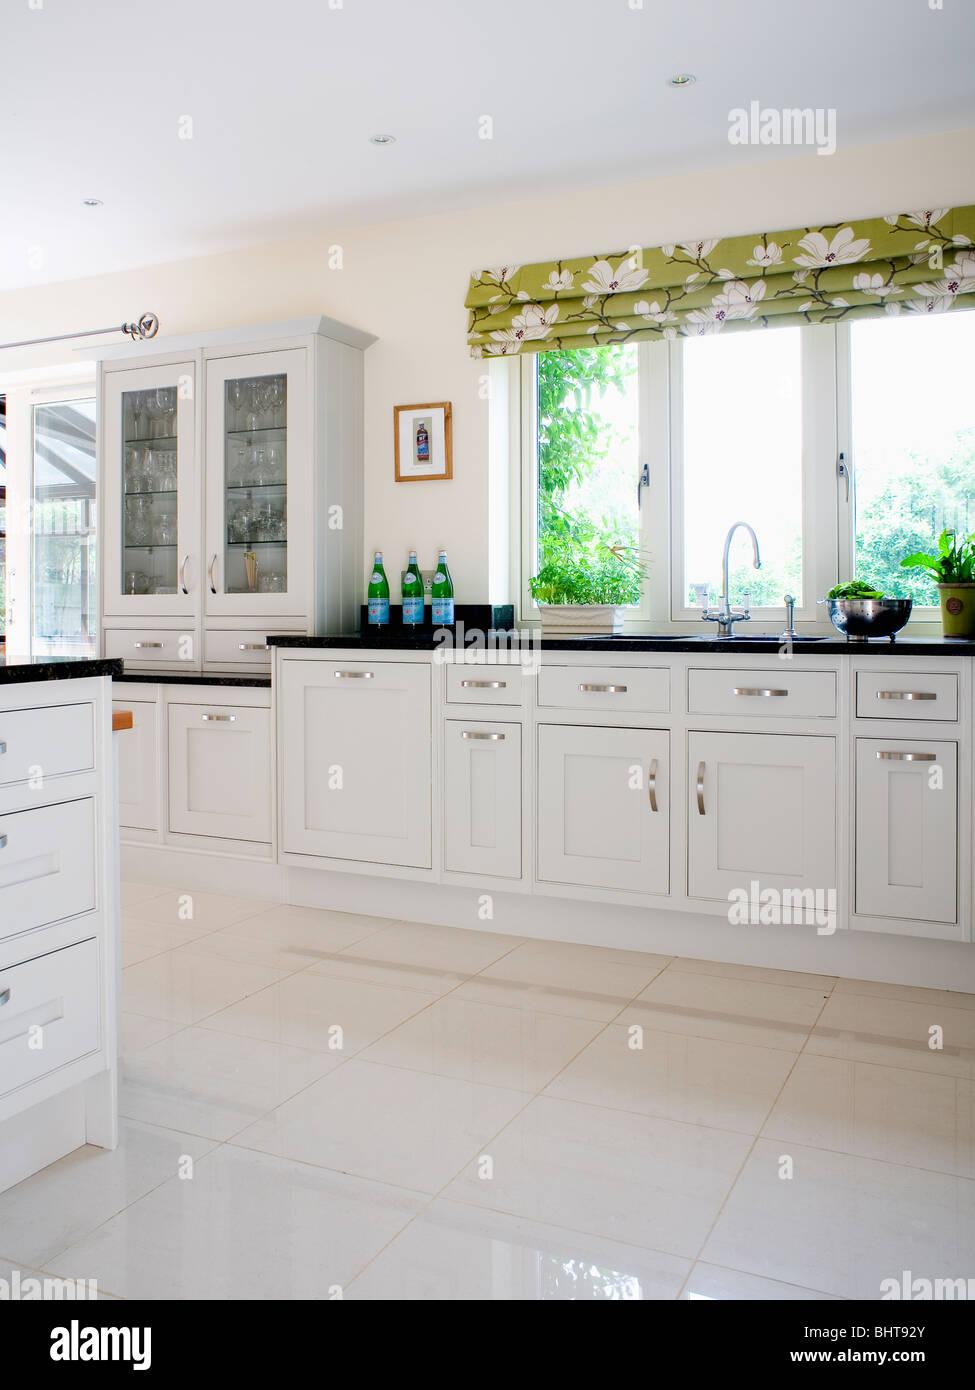 Soft Kitchen Flooring Kitchen Flooring Blind Soft Furnishings Stock Photos Kitchen